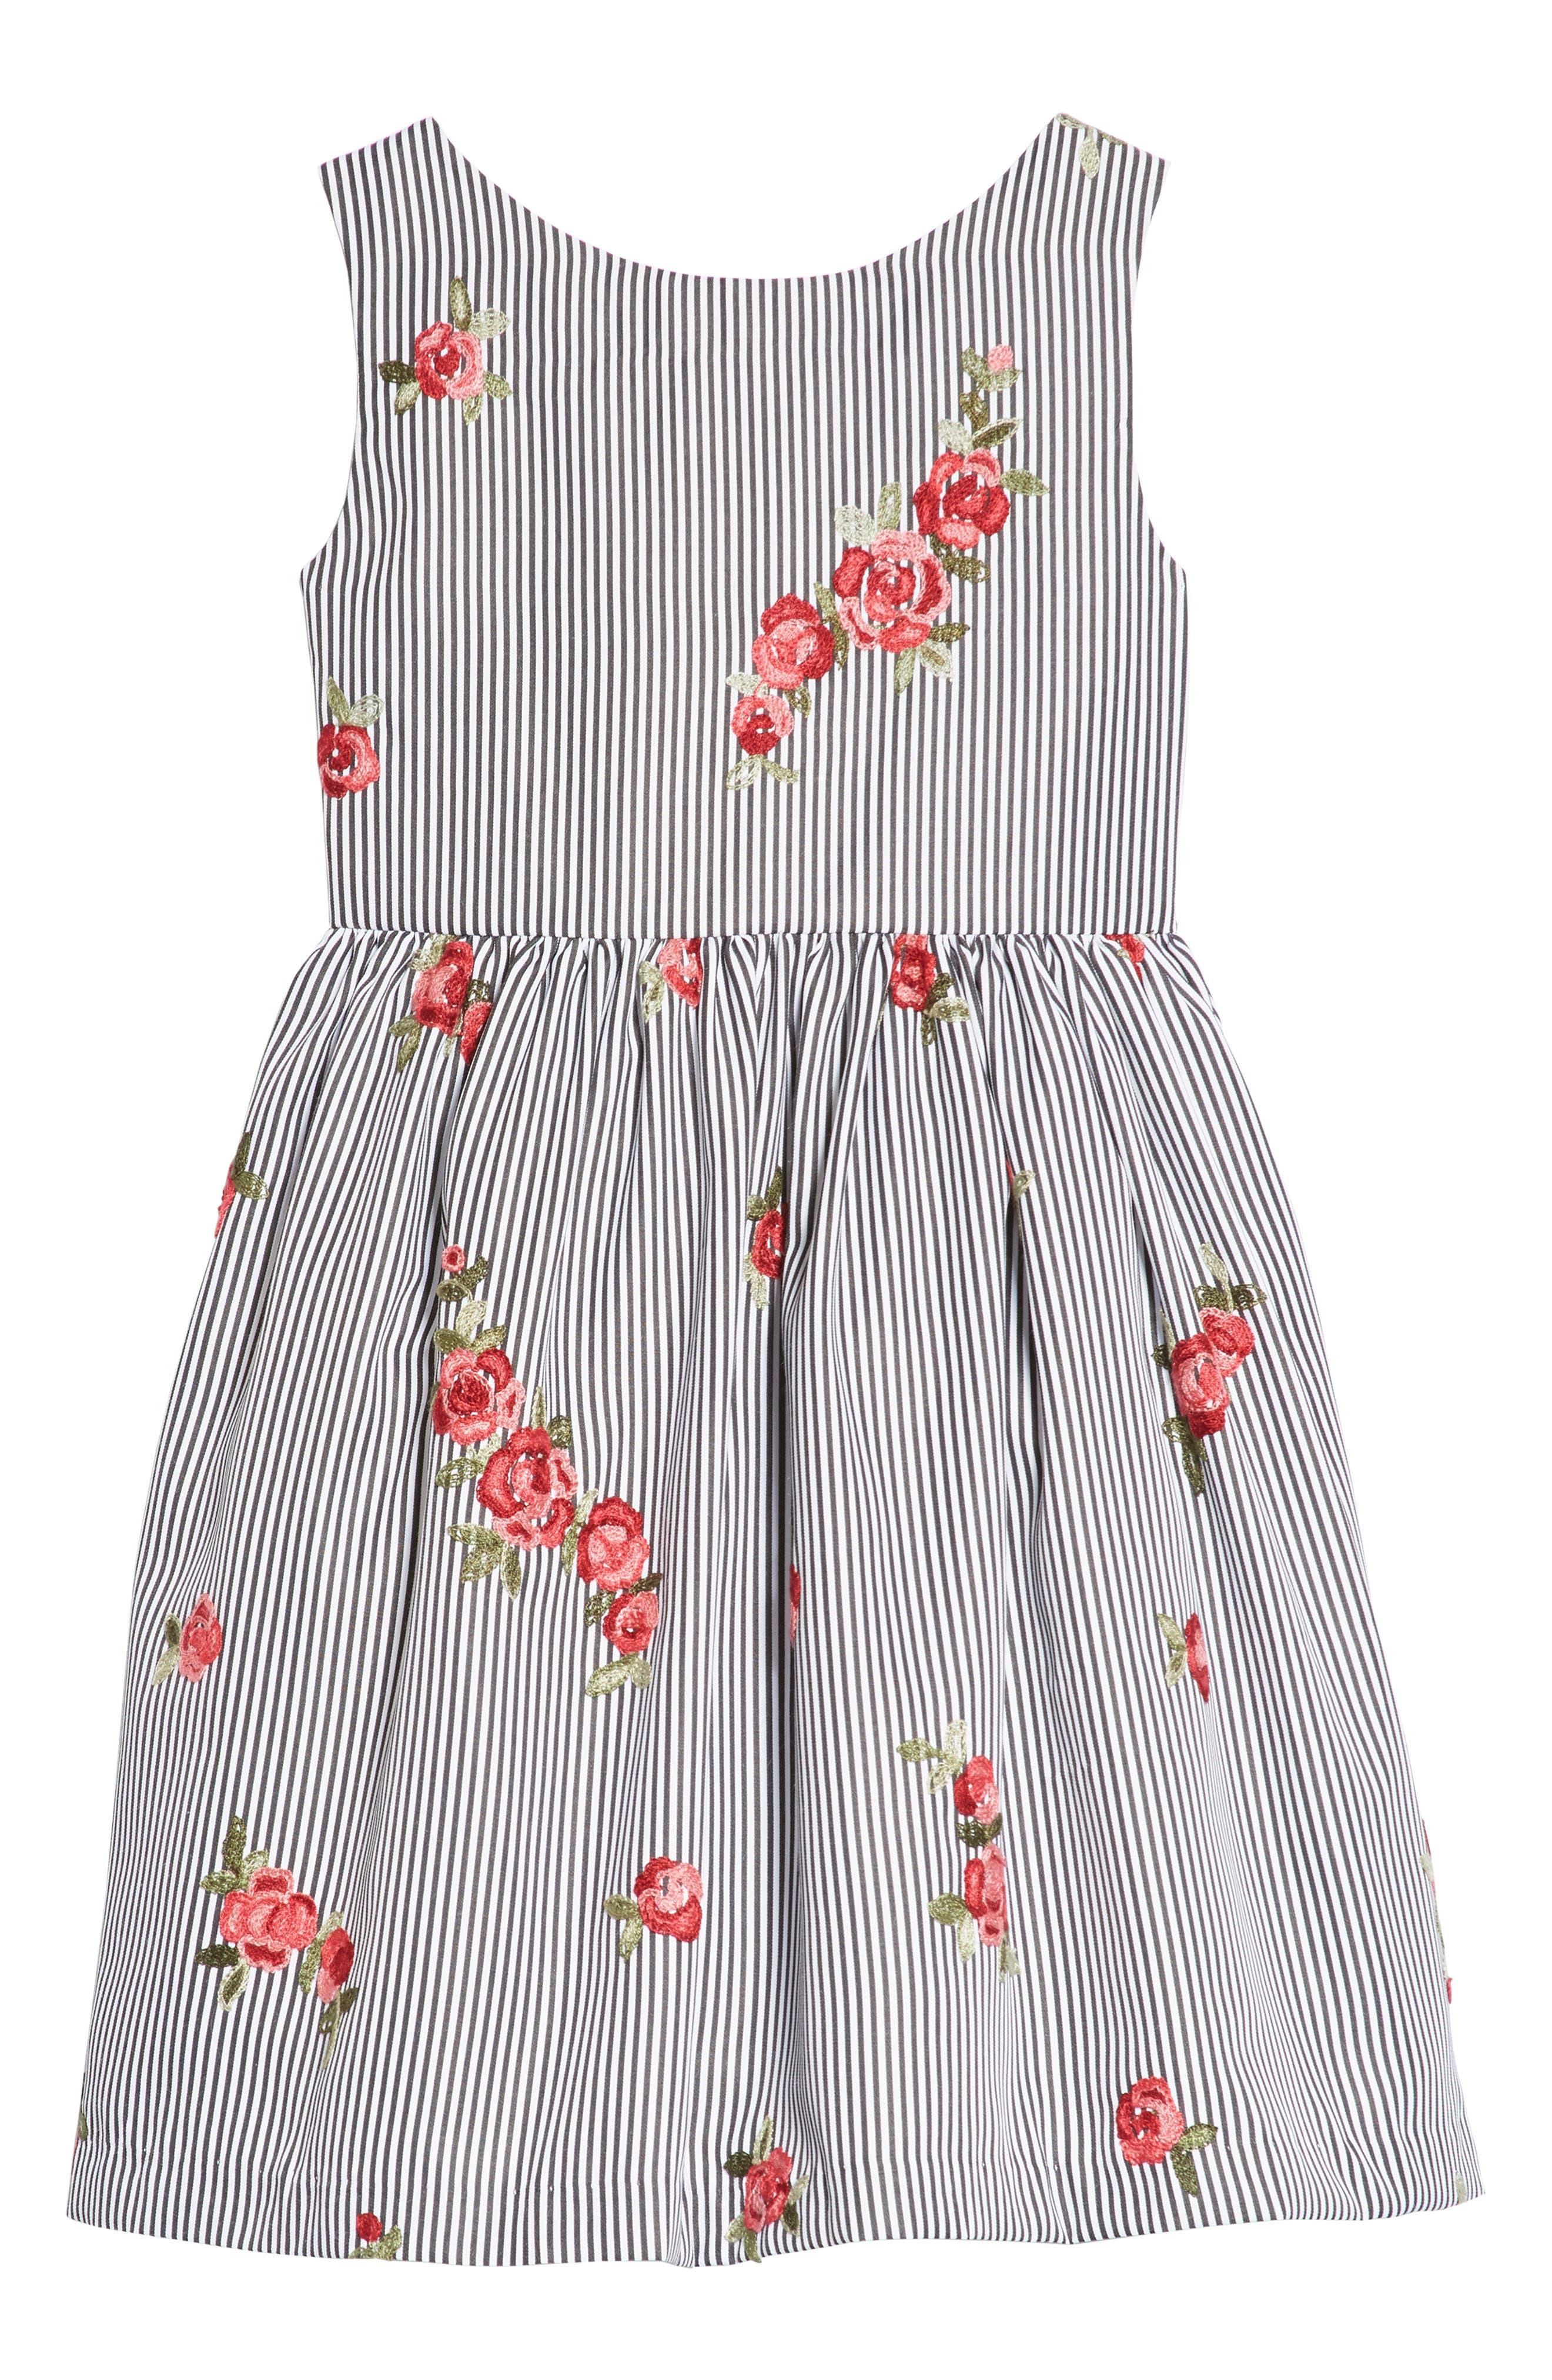 Embroidered Stripe Dress,                         Main,                         color, Black/ White